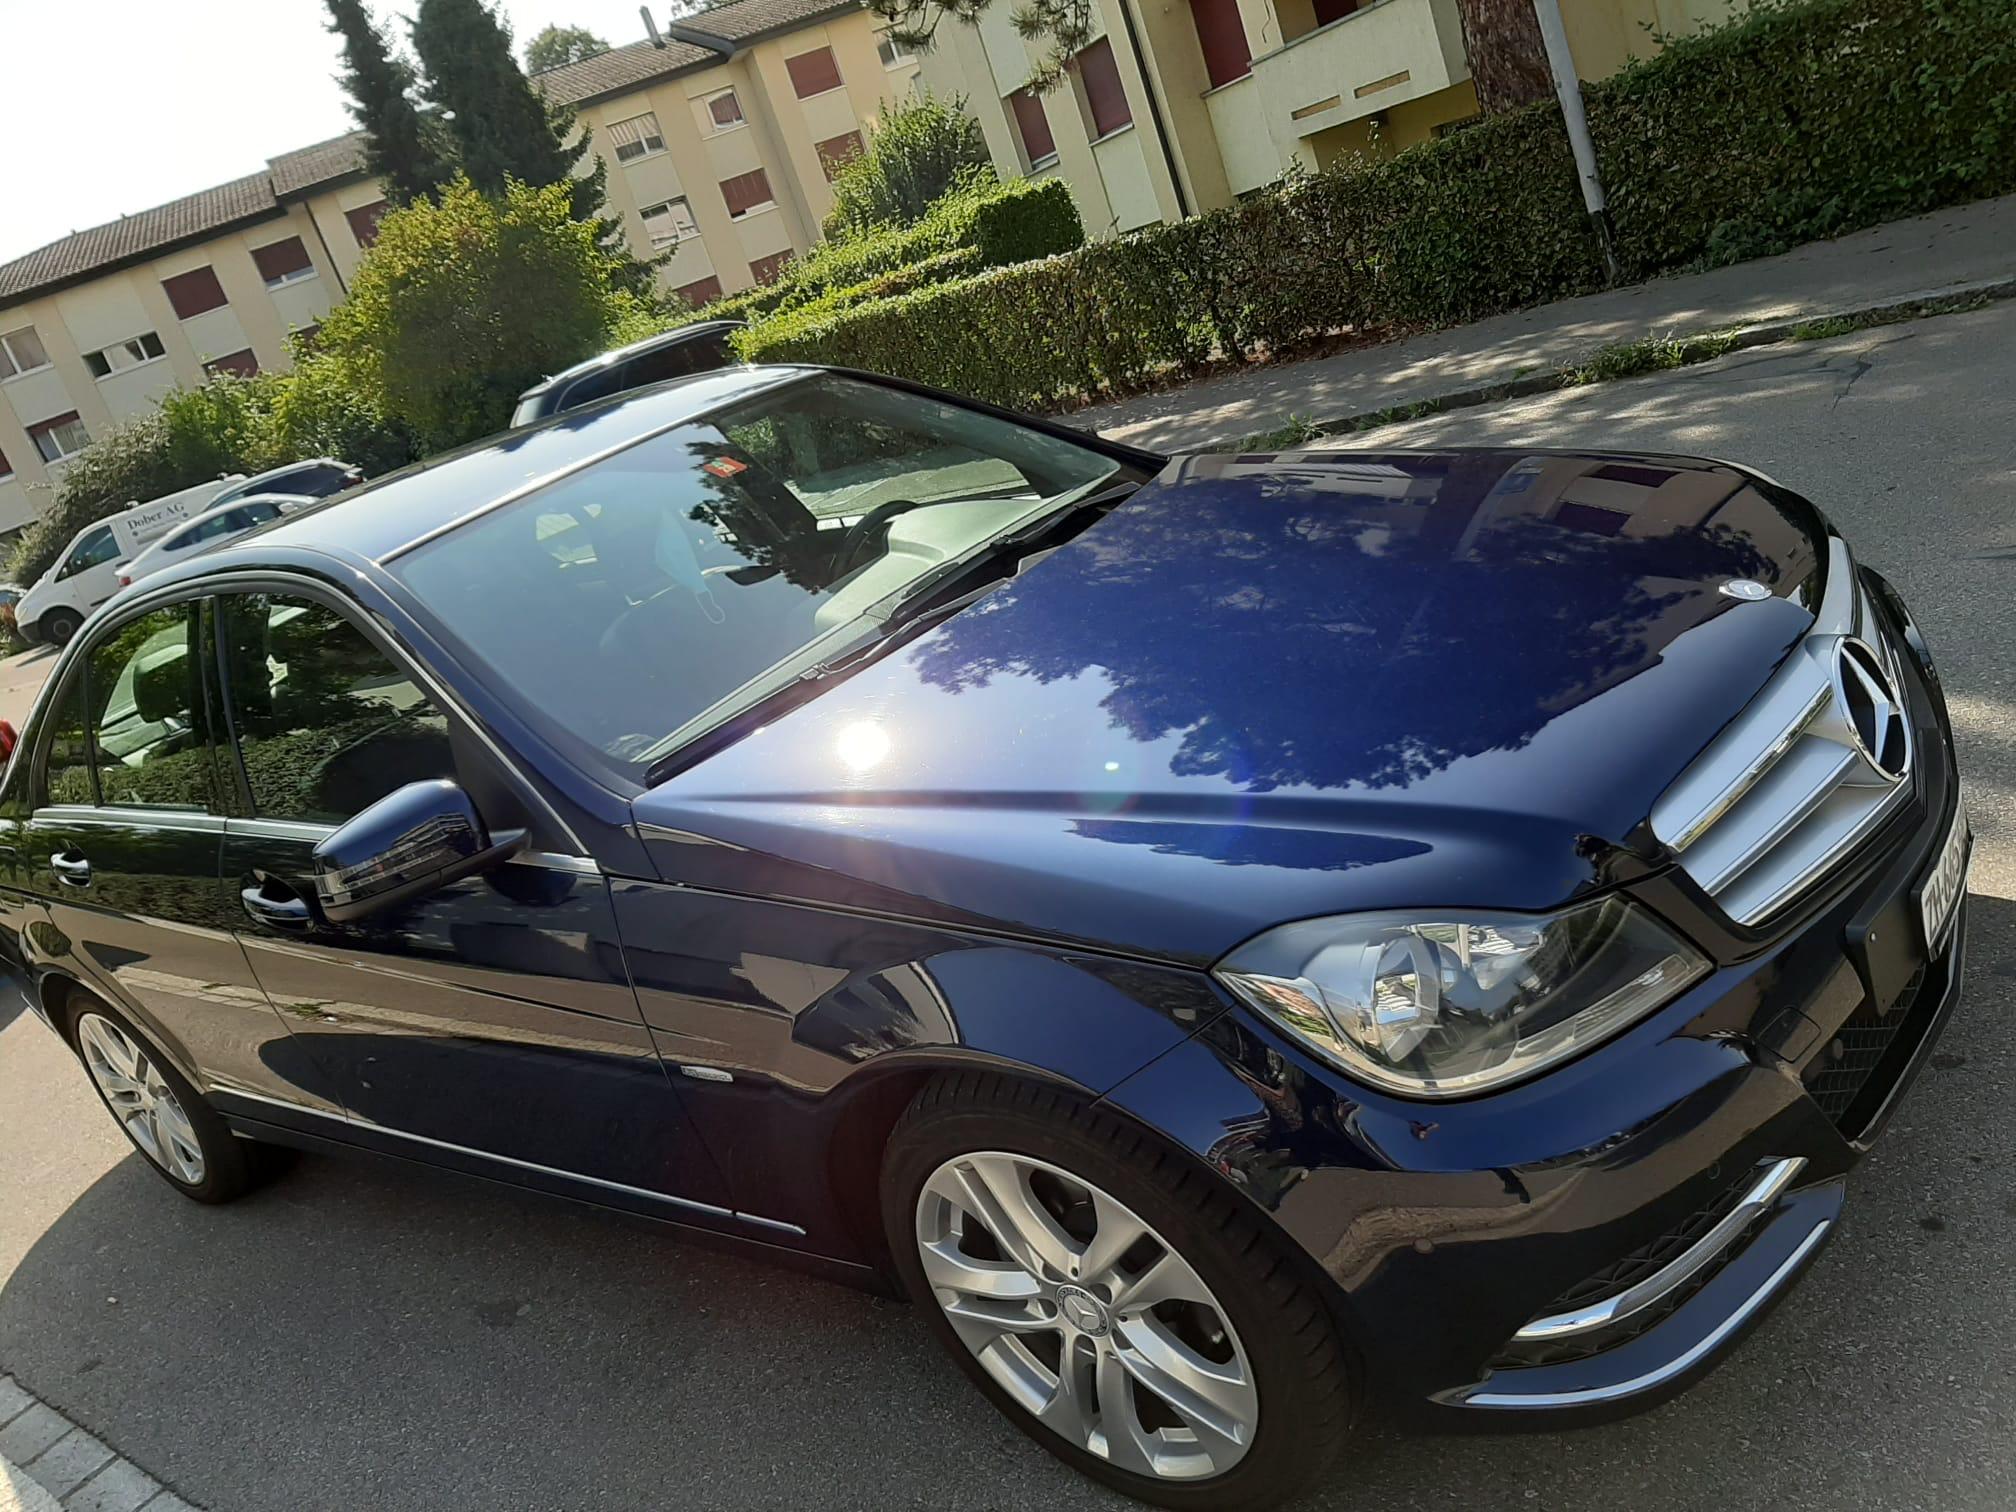 Buy Used Car Sedan Mercedes Benz C Klasse C 180 Blueef Avantgarde 147000 Km At 9800 Chf On Carforyou Ch